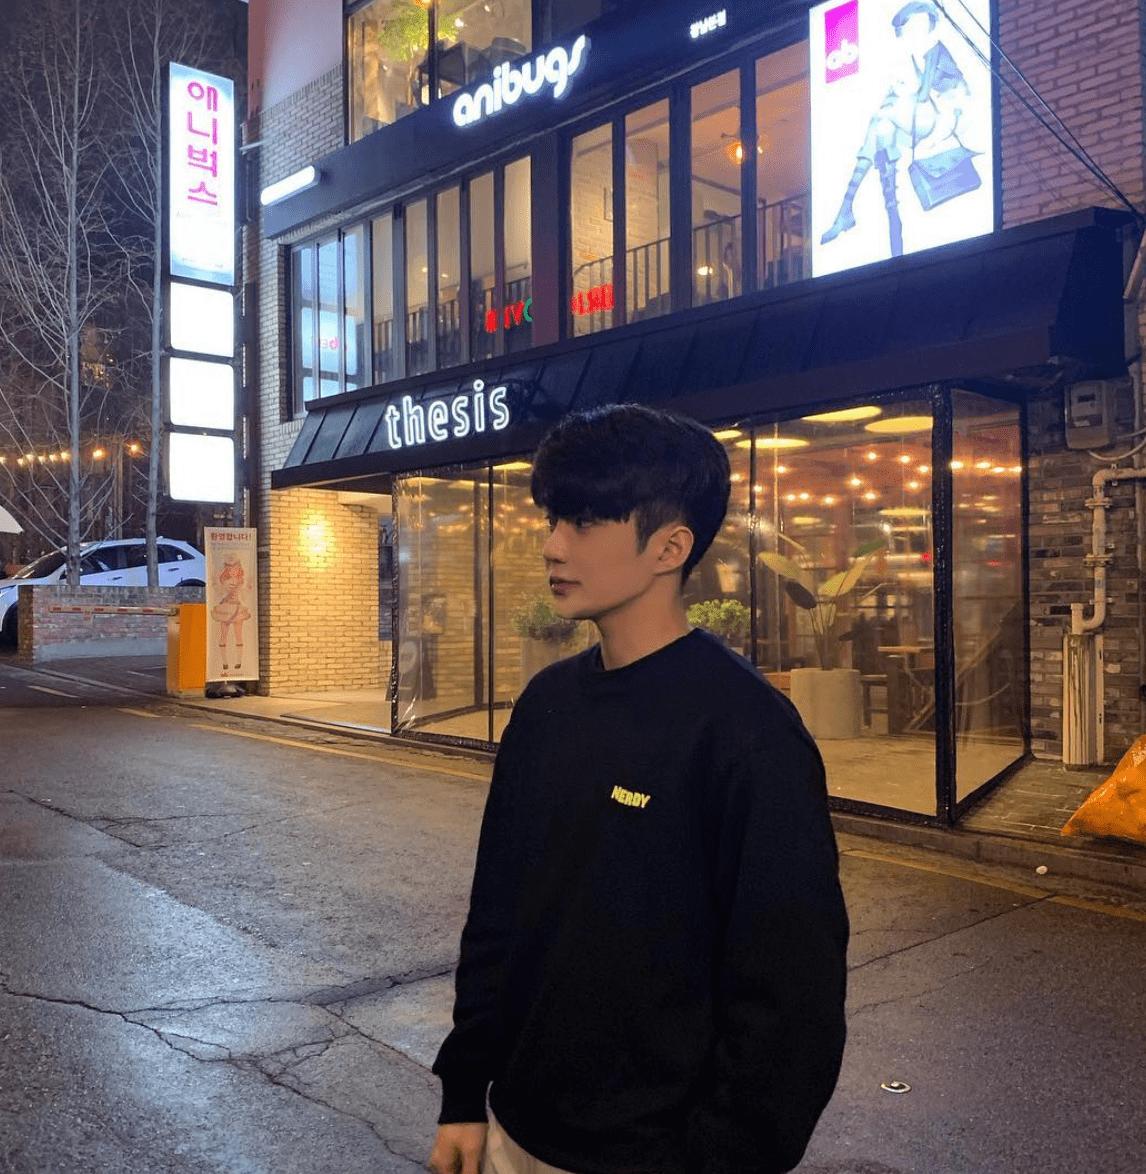 korean-instagram-influencer-social-media-model-follow-babyho0n-5.png